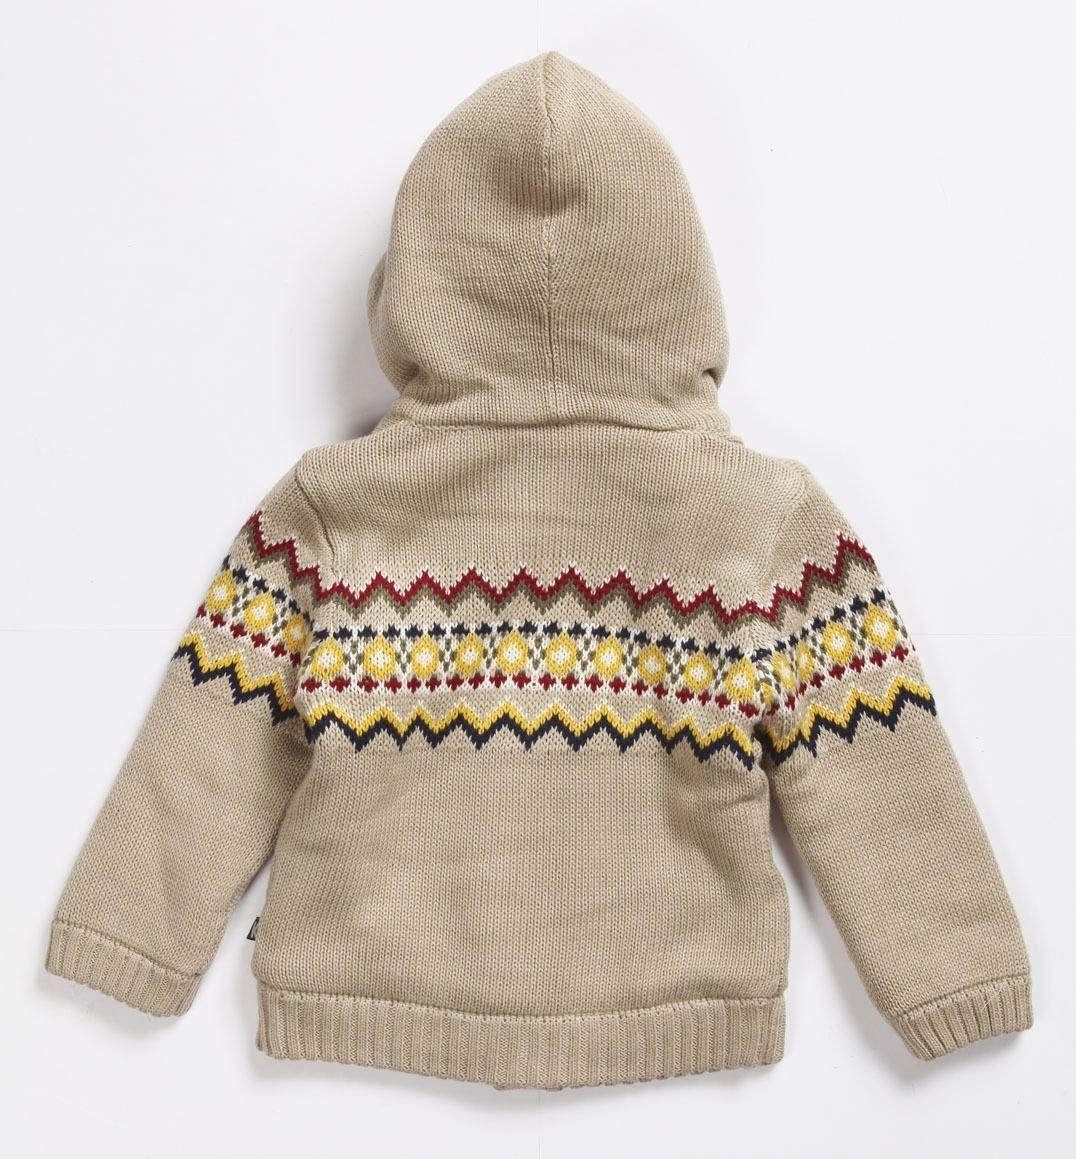 KANZ Sweater Jacket